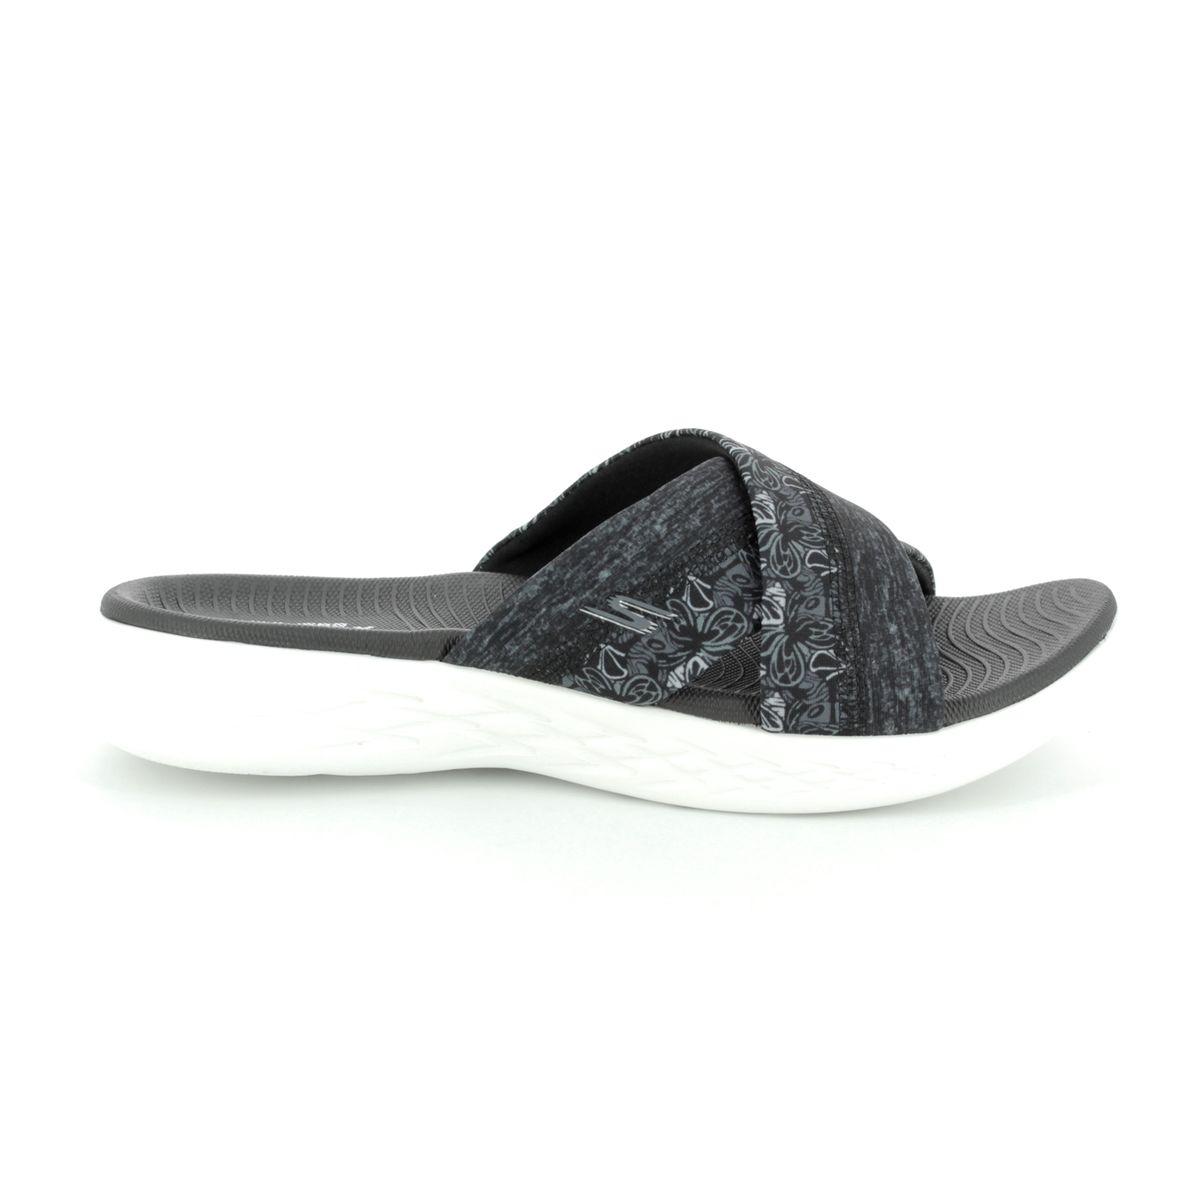 8af8e257d5a7 Skechers Monarch 600 15306 BKW Black-white sandals